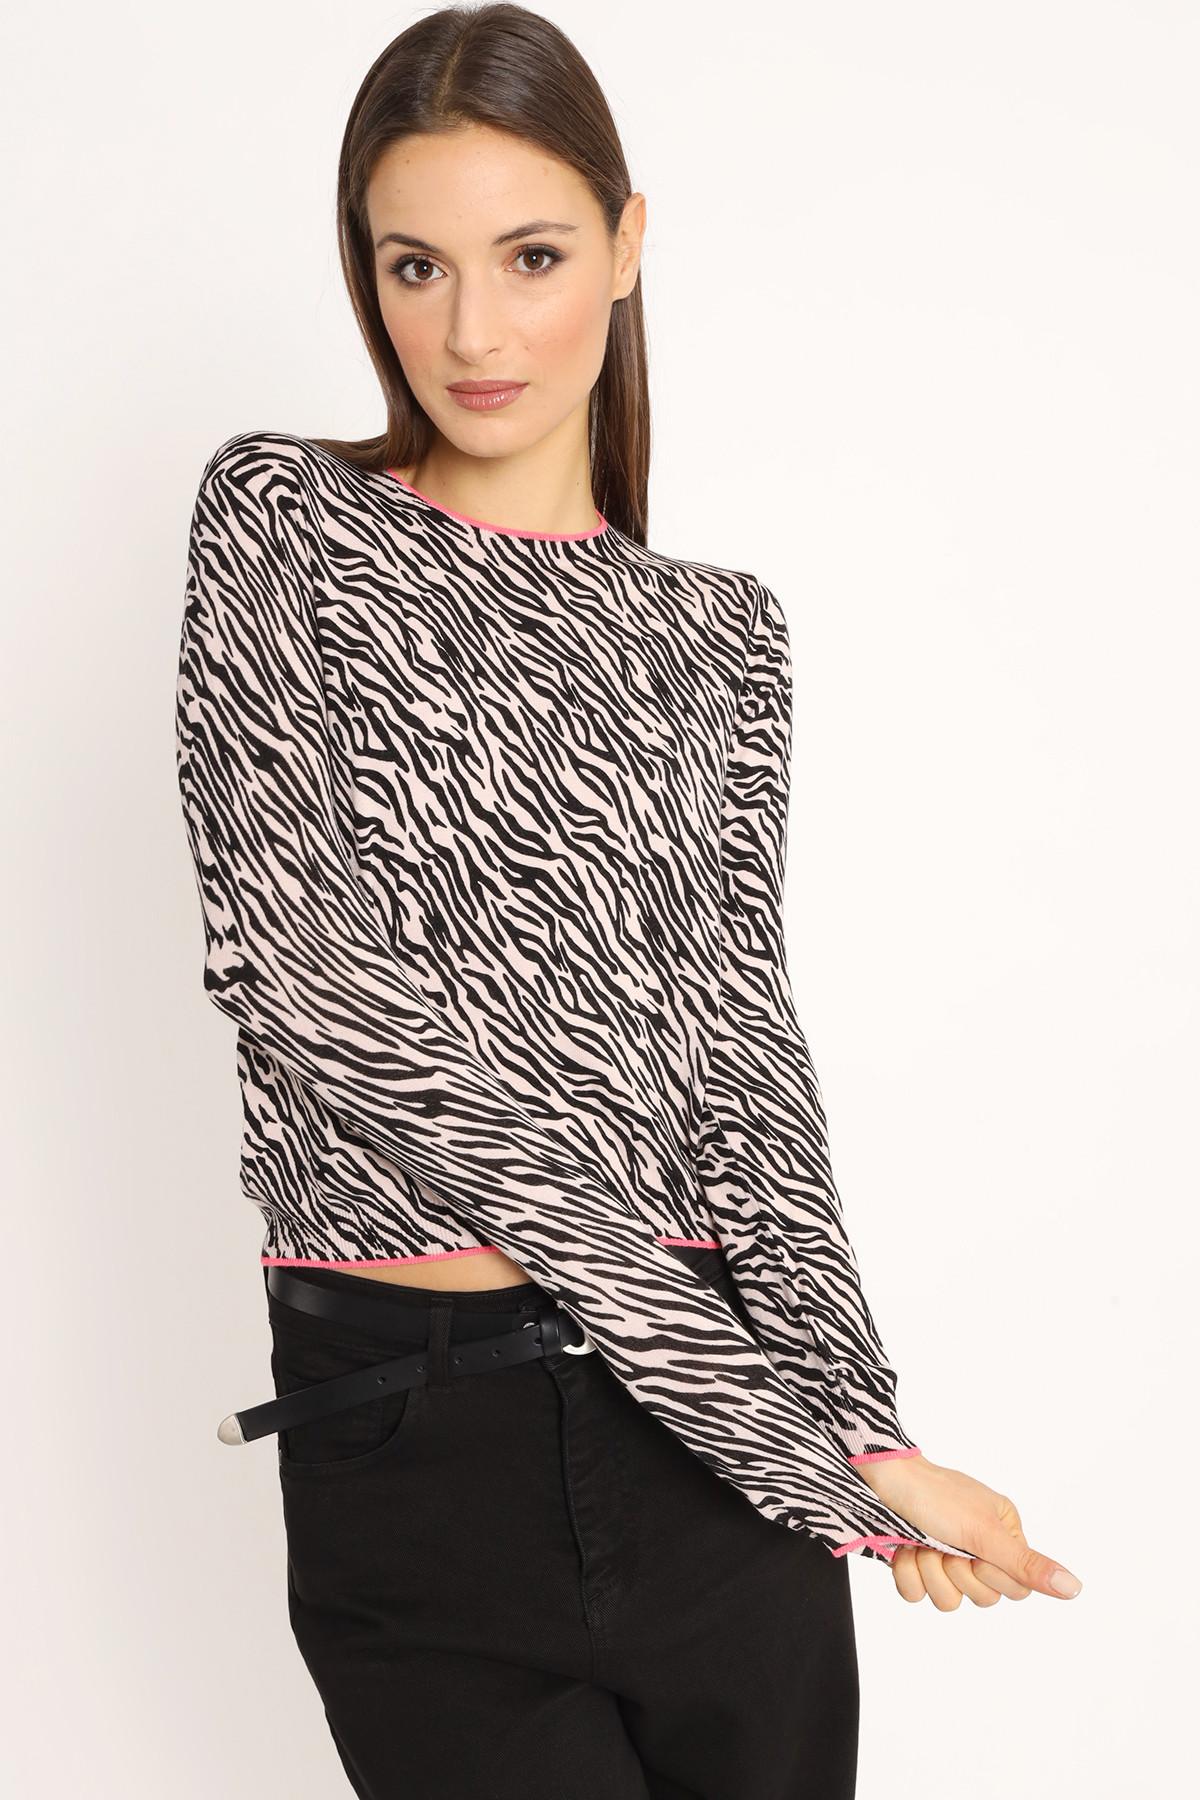 Zebra Print Sweater with Contrast Edges